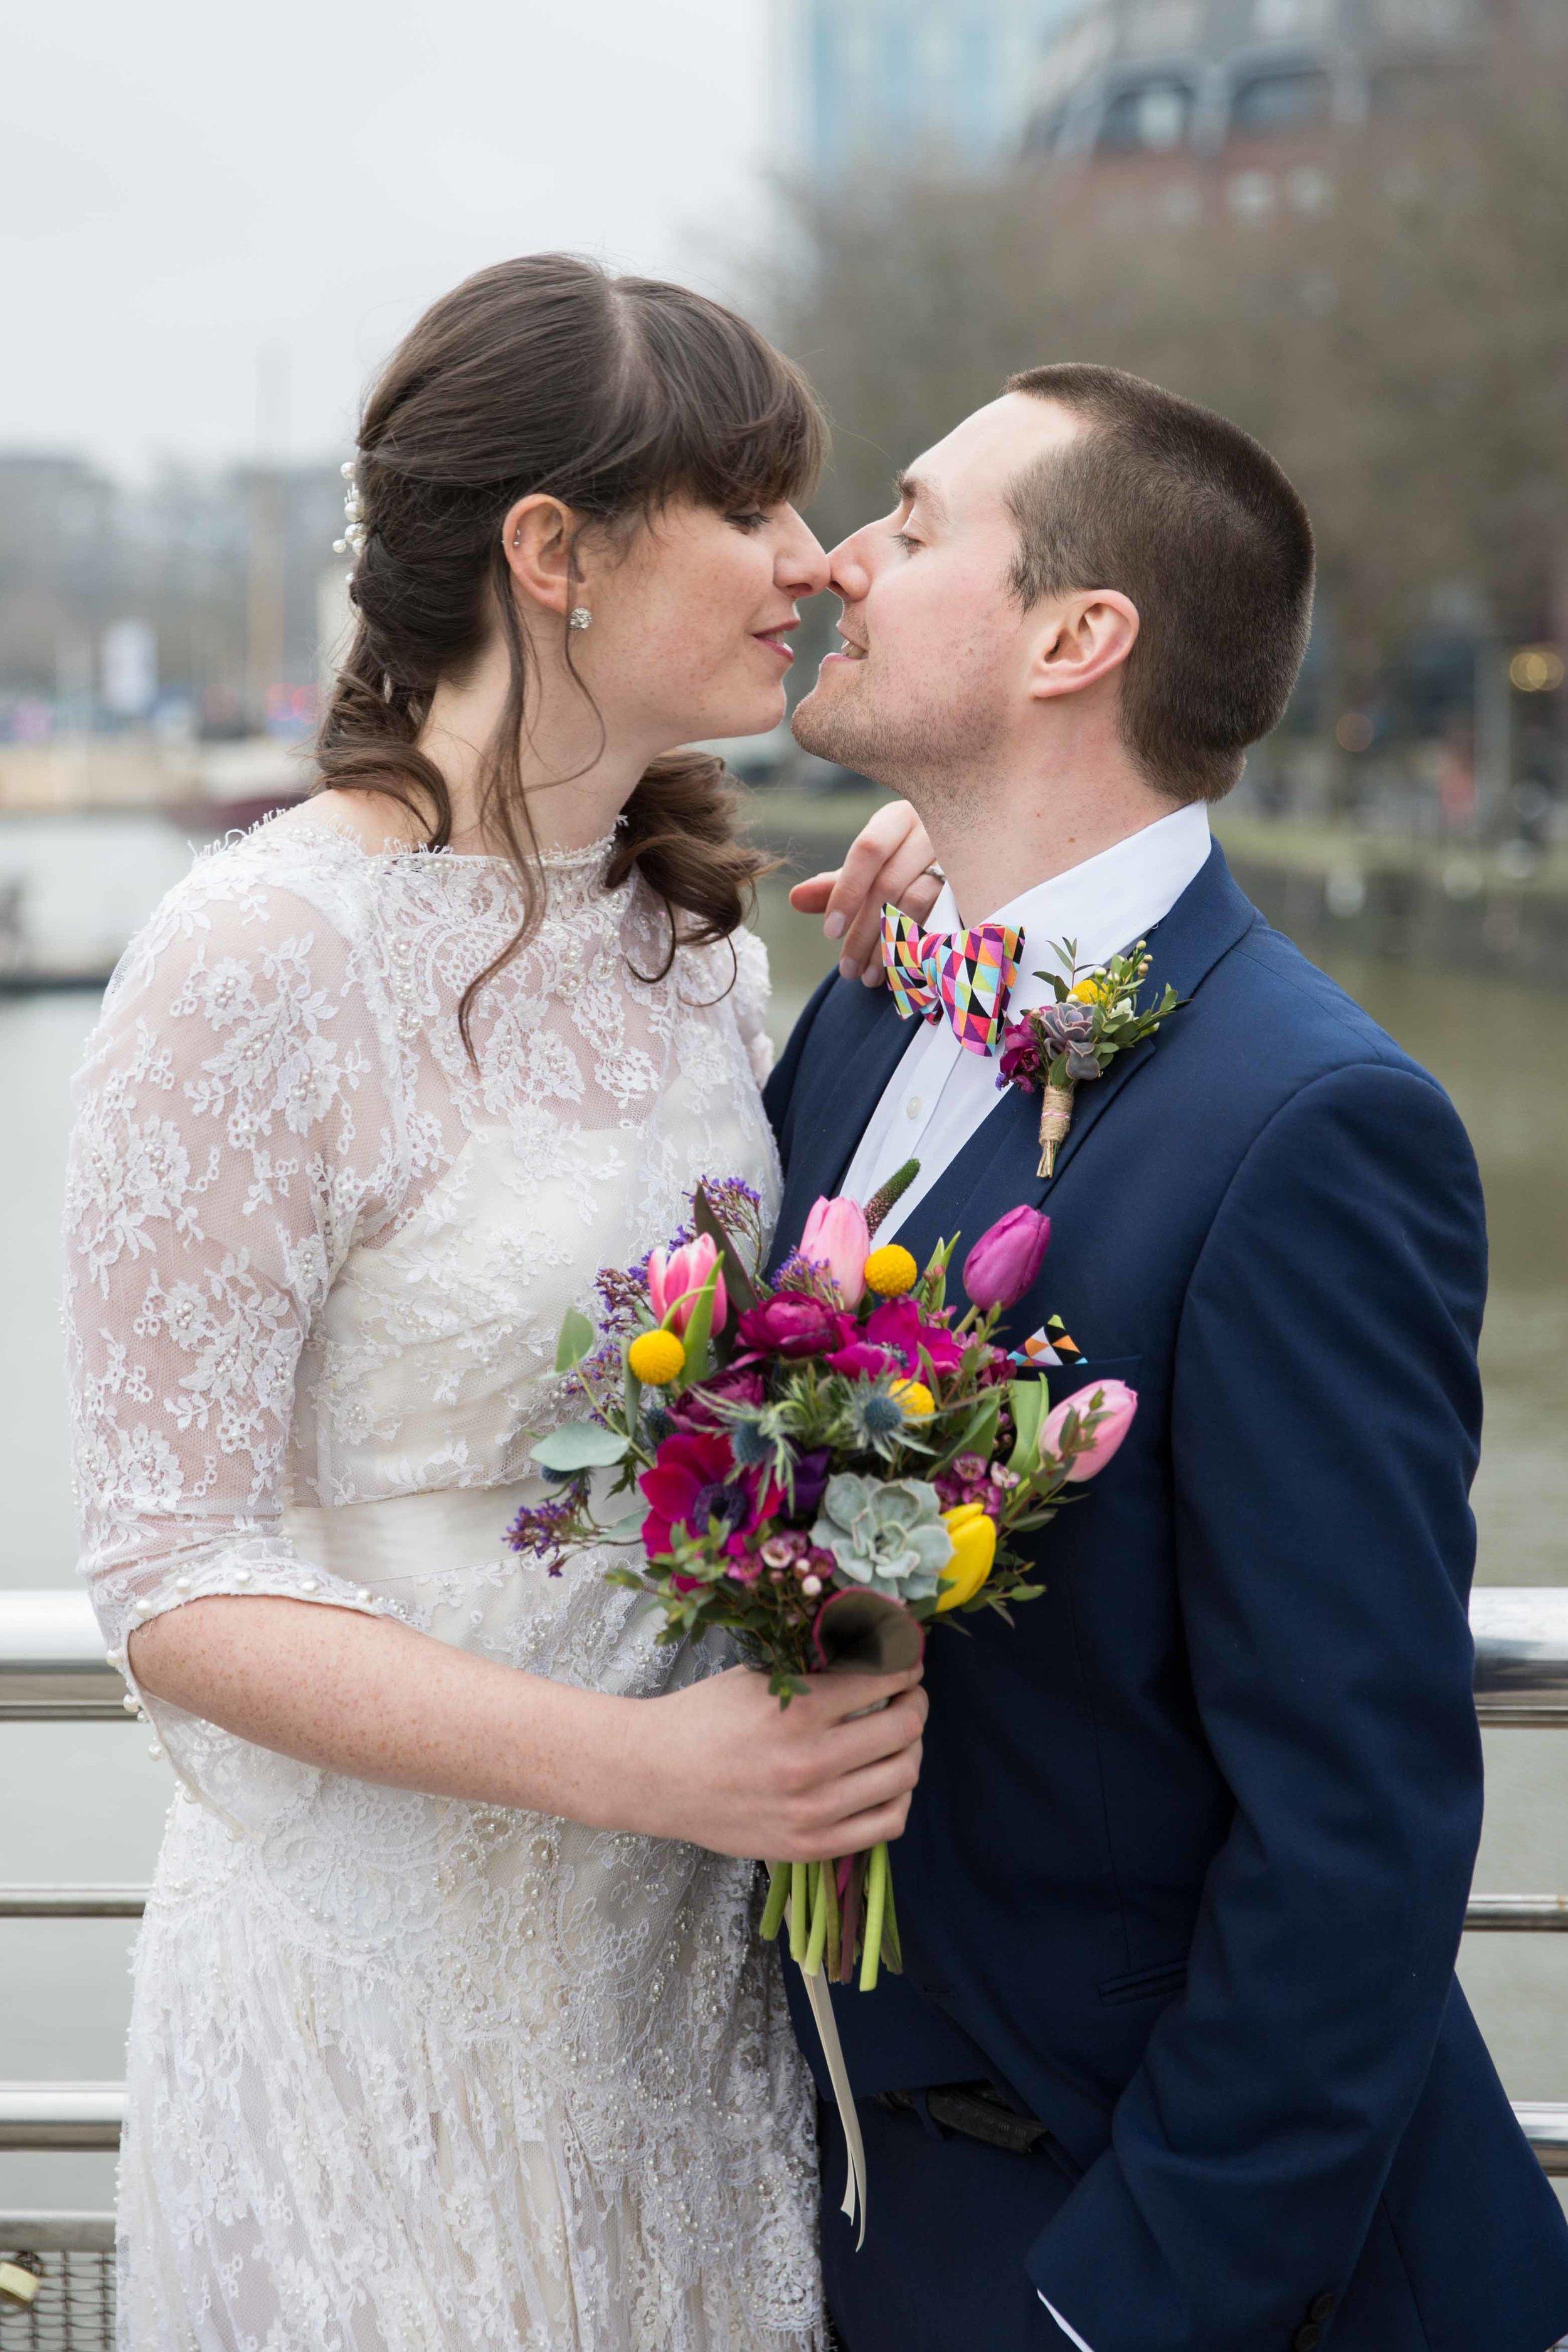 Adam & Faye - Wright Wedding Photography - Bristol Wedding Photographer -245.jpg